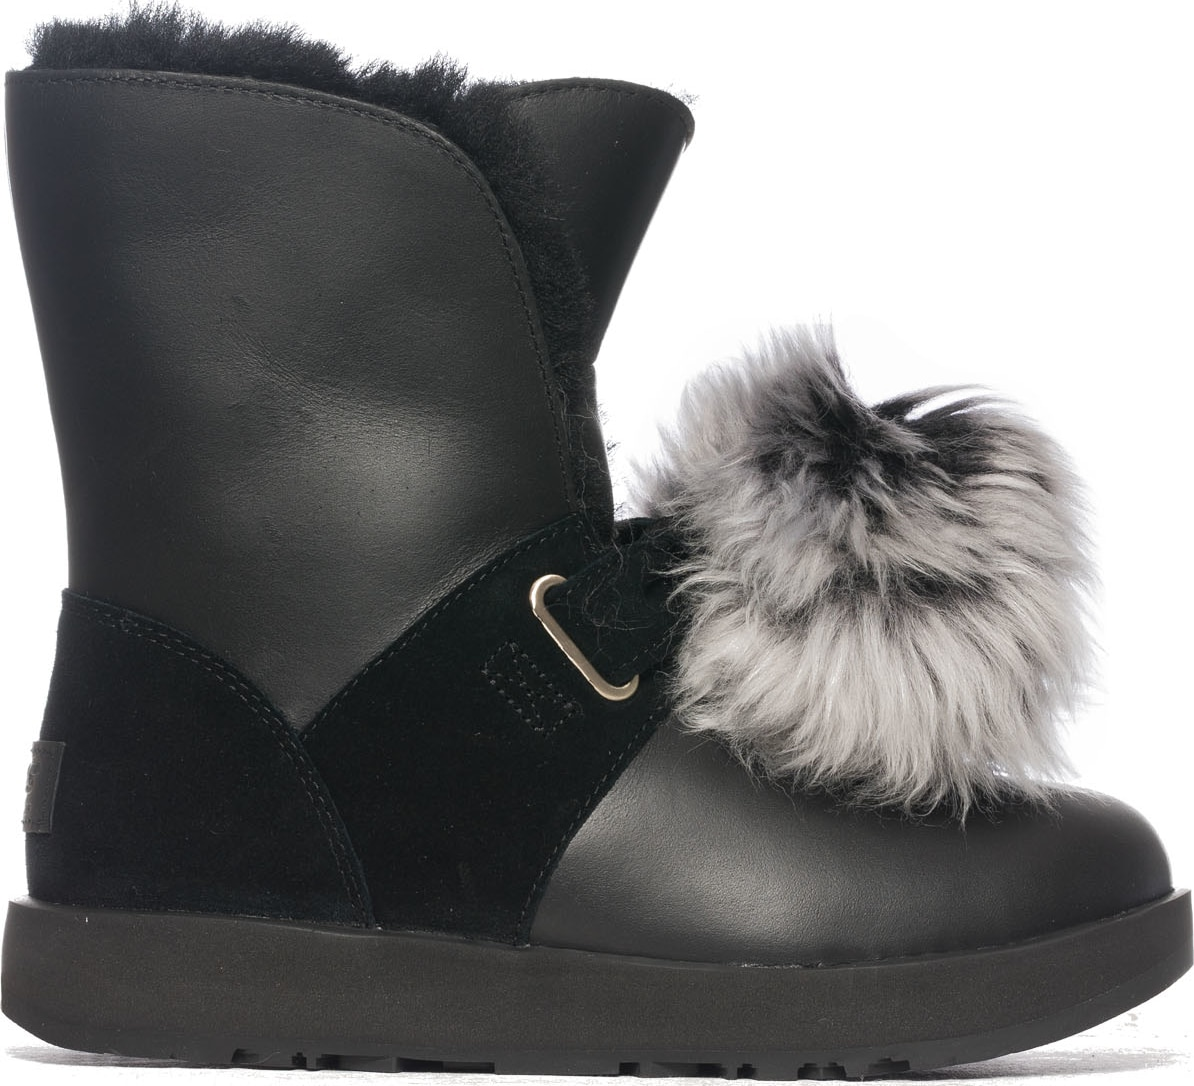 515781ee7ee UGG - Isley Waterproof Boot - Black